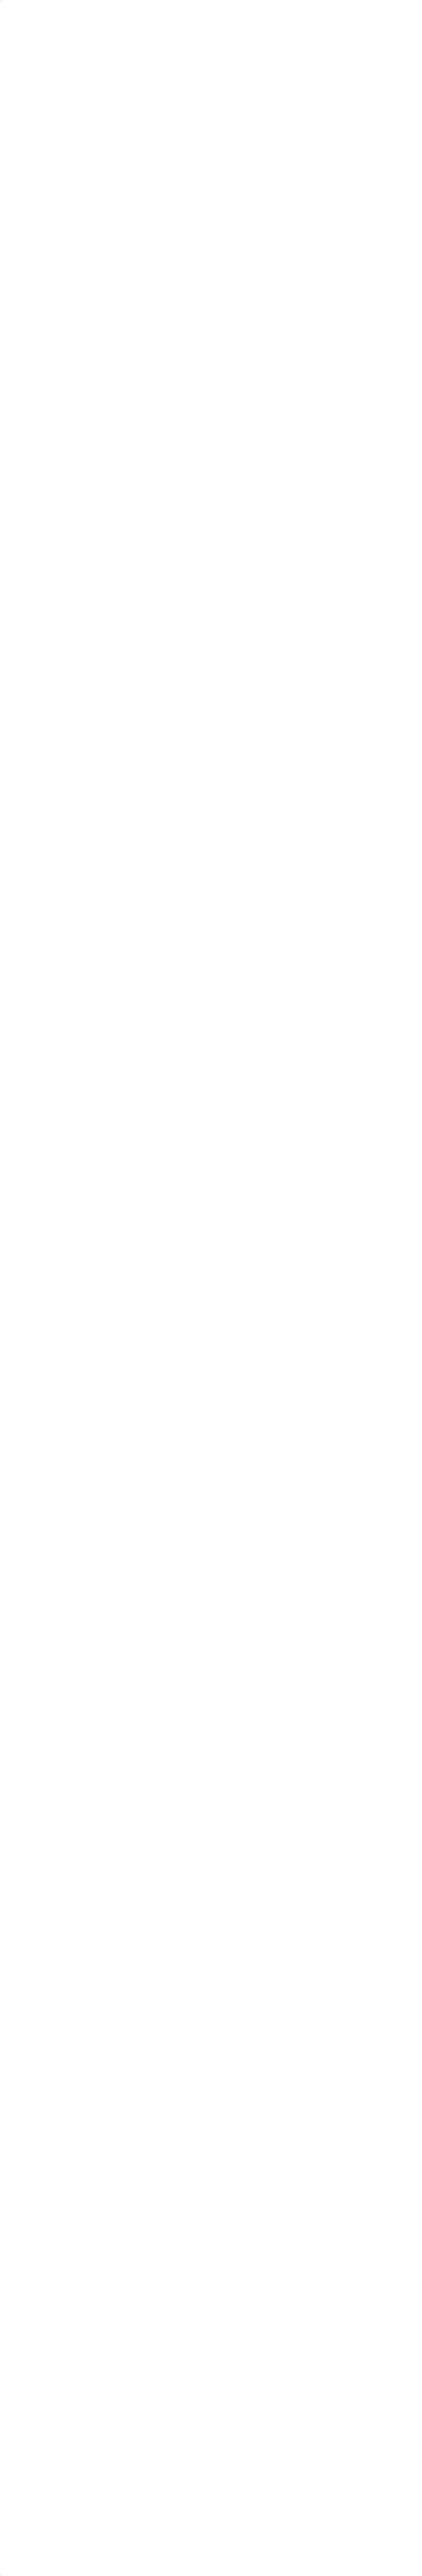 calendario-2017-prova